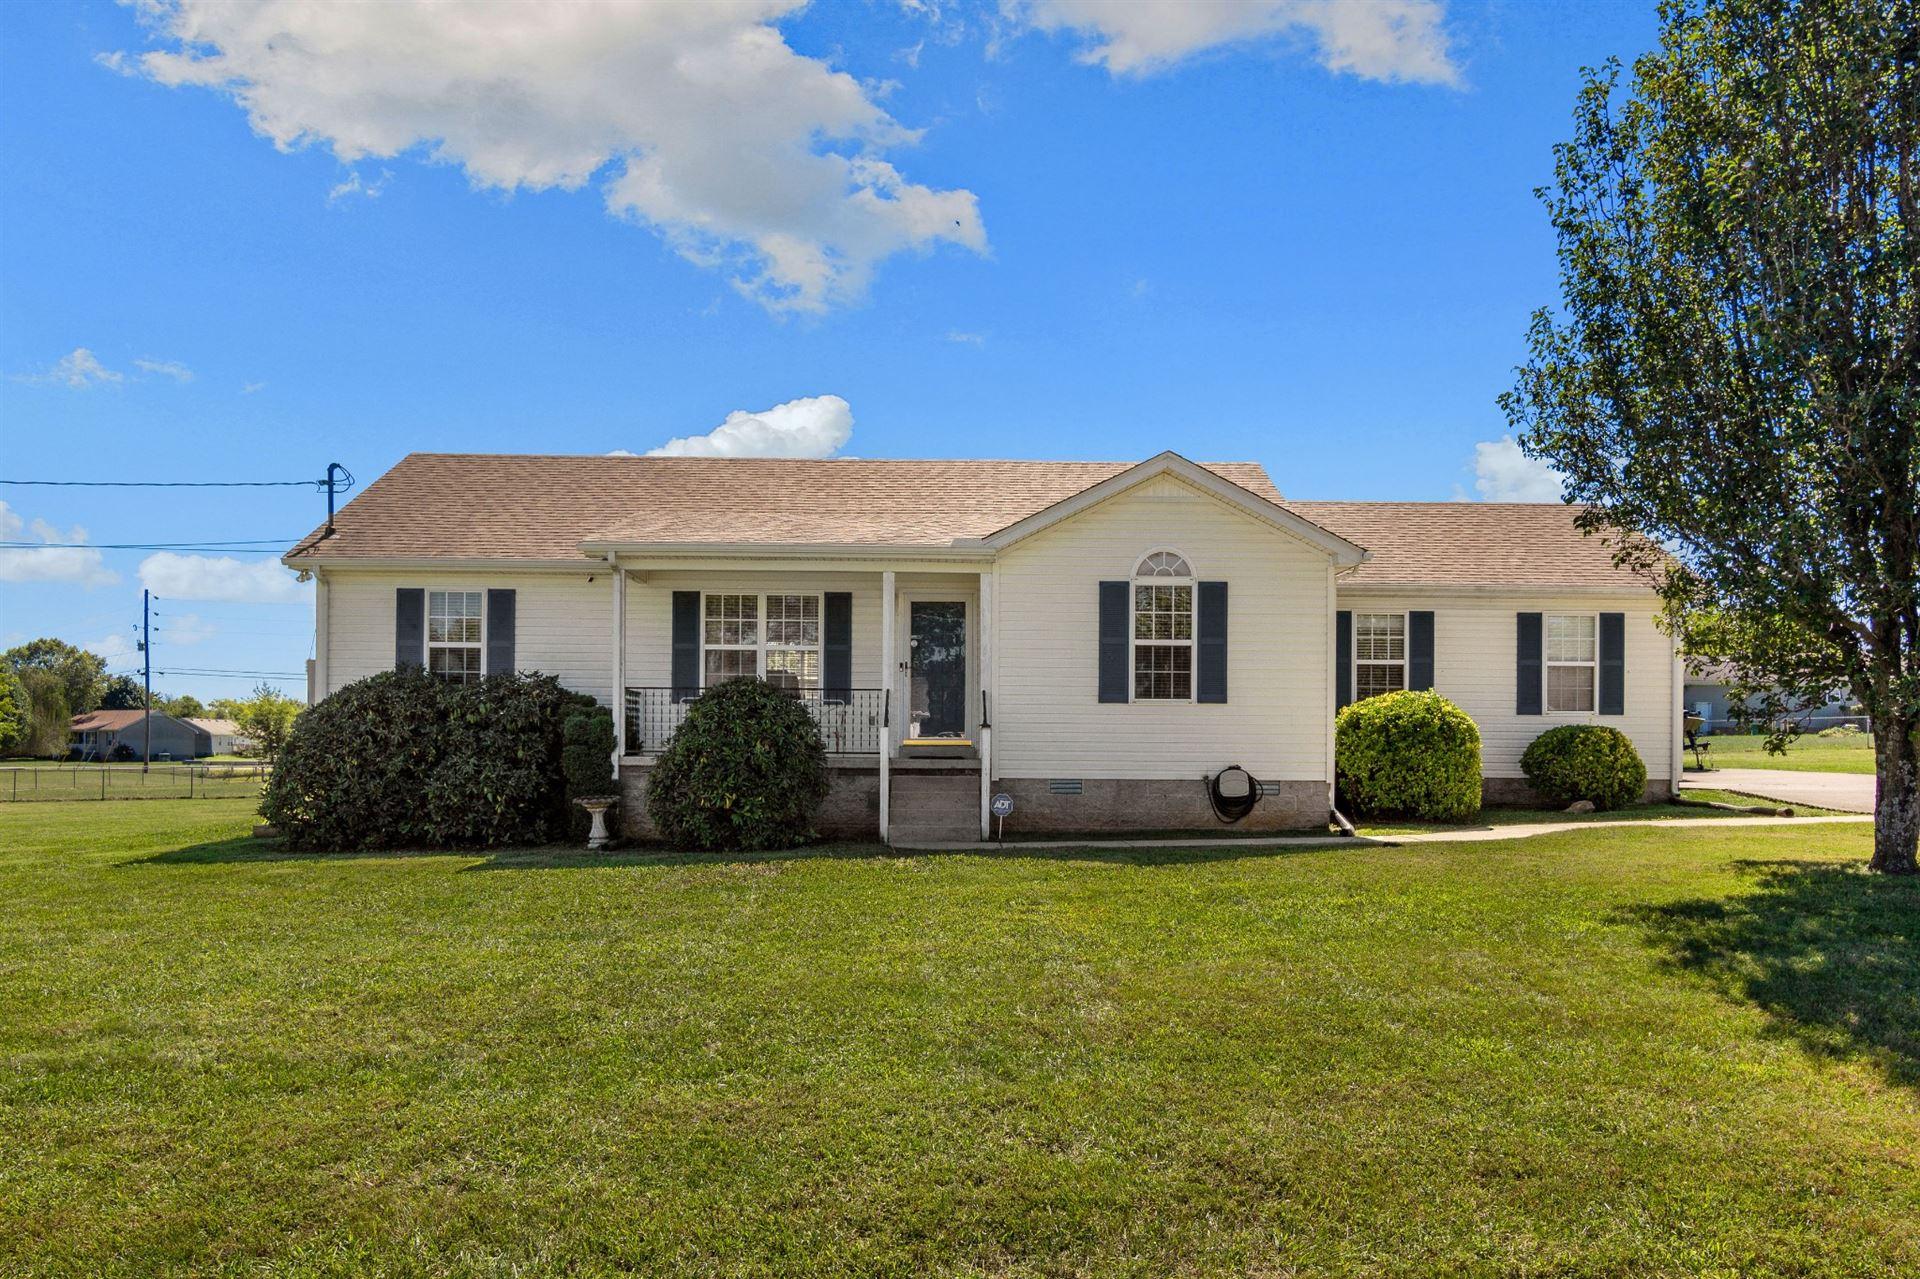 1513 Tellico Ave, Murfreesboro, TN 37129 - MLS#: 2293617